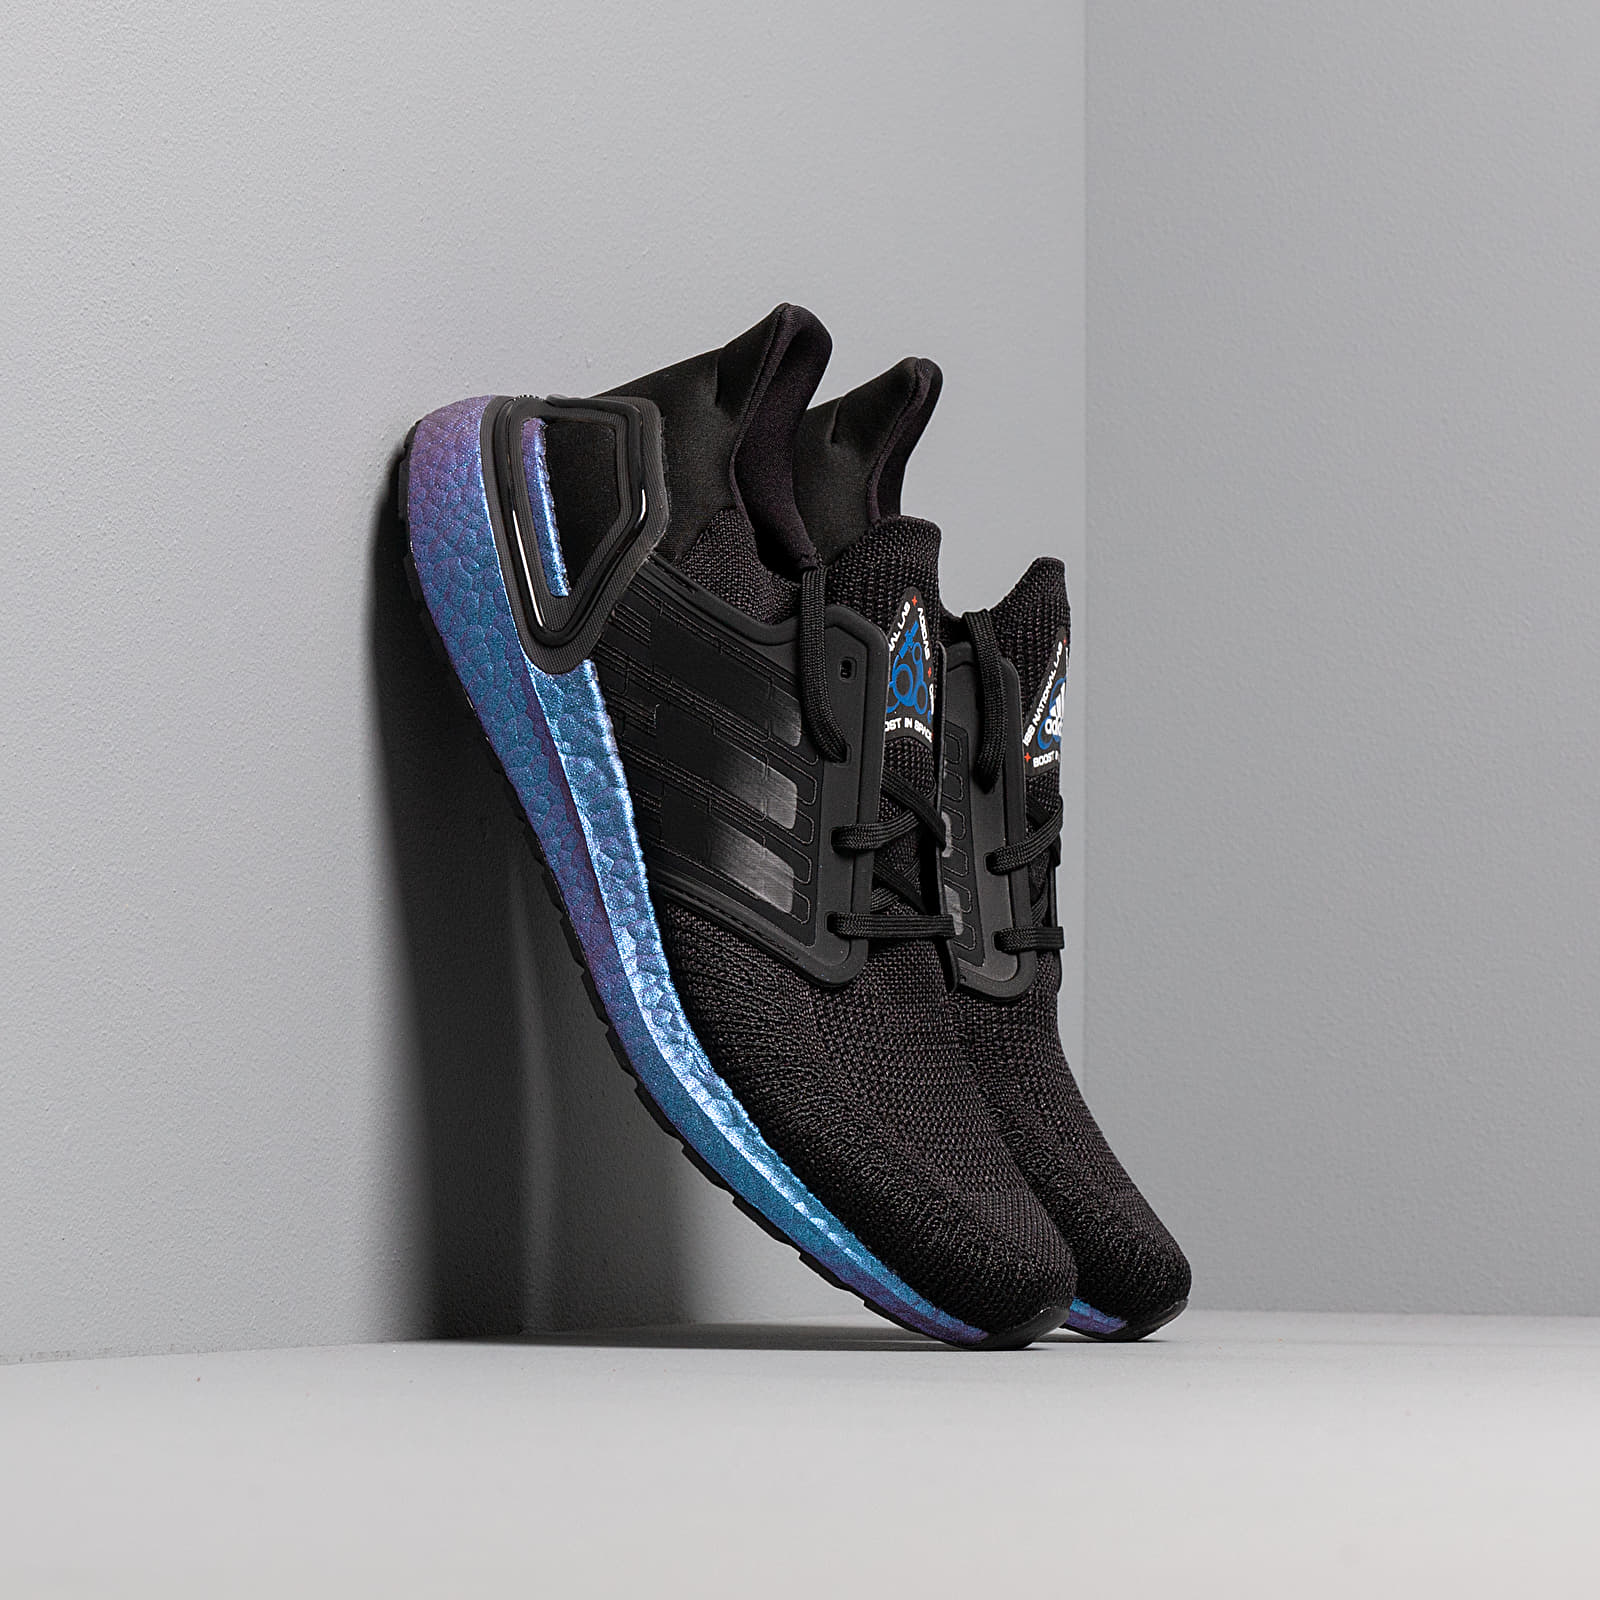 adidas UltraBOOST 20 Core Black Core Black Blue Vime | Footshop